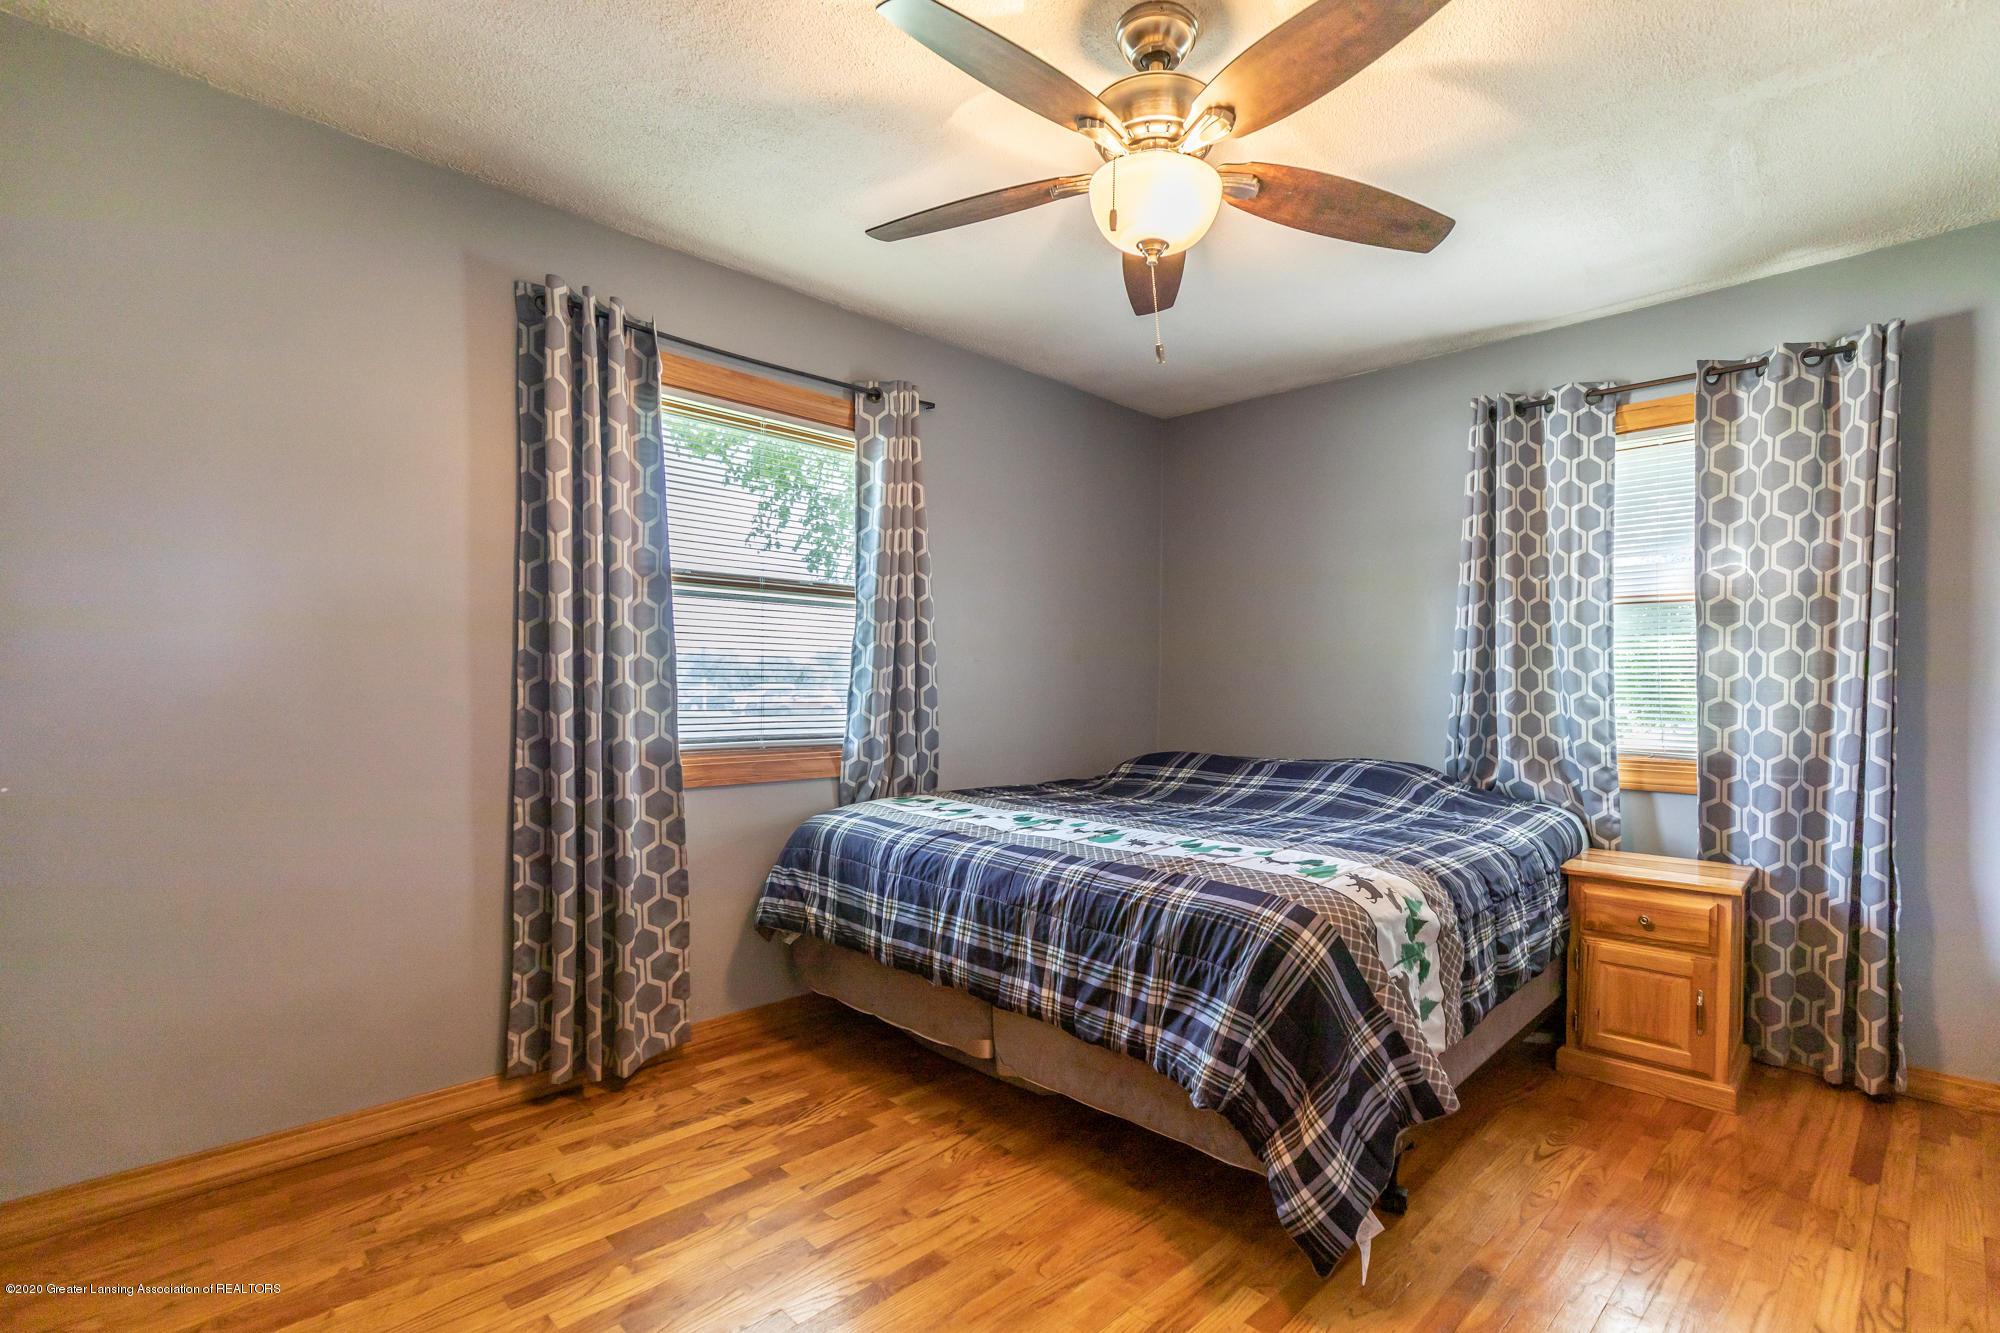 205 W Herbison Rd - Master bedroom - 15